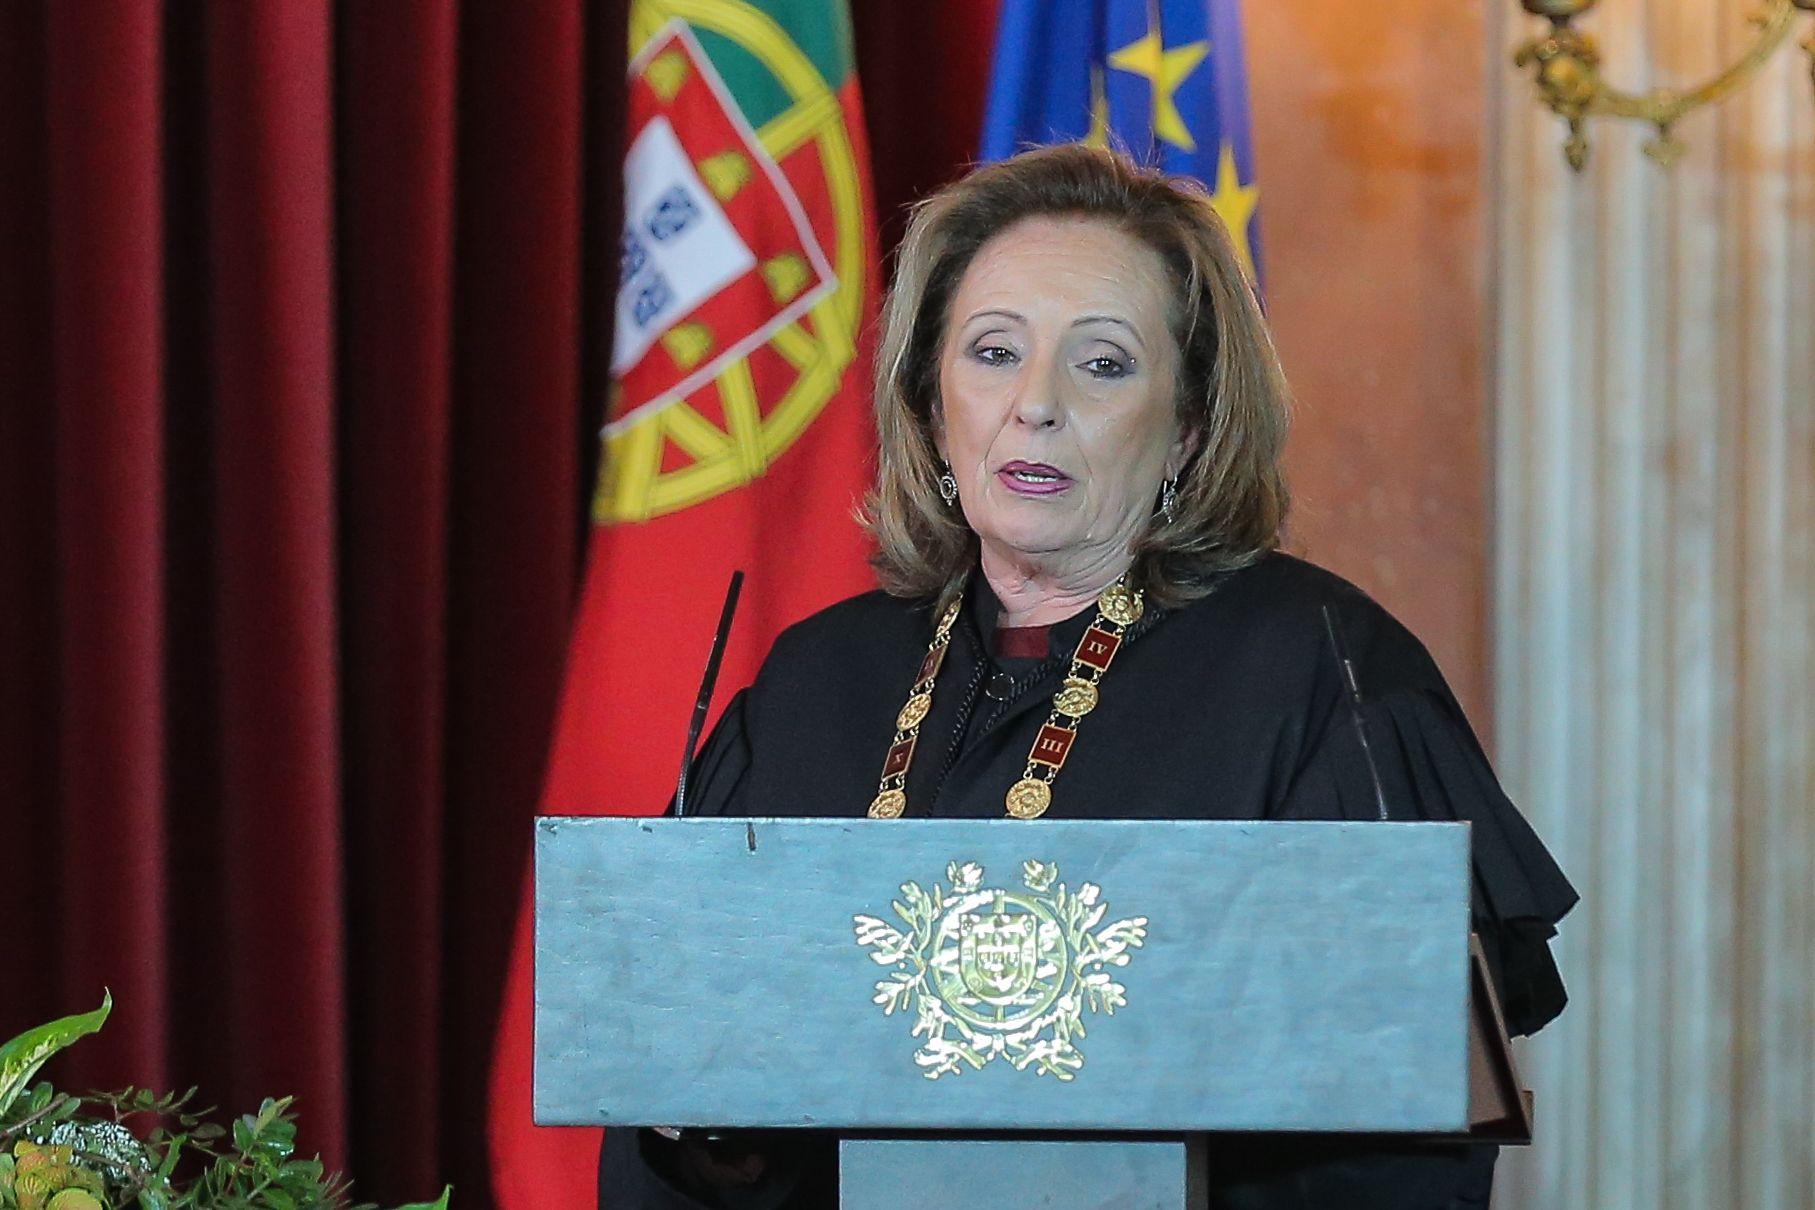 Parlamento vai ouvir Lucília Gago sobre violência doméstica